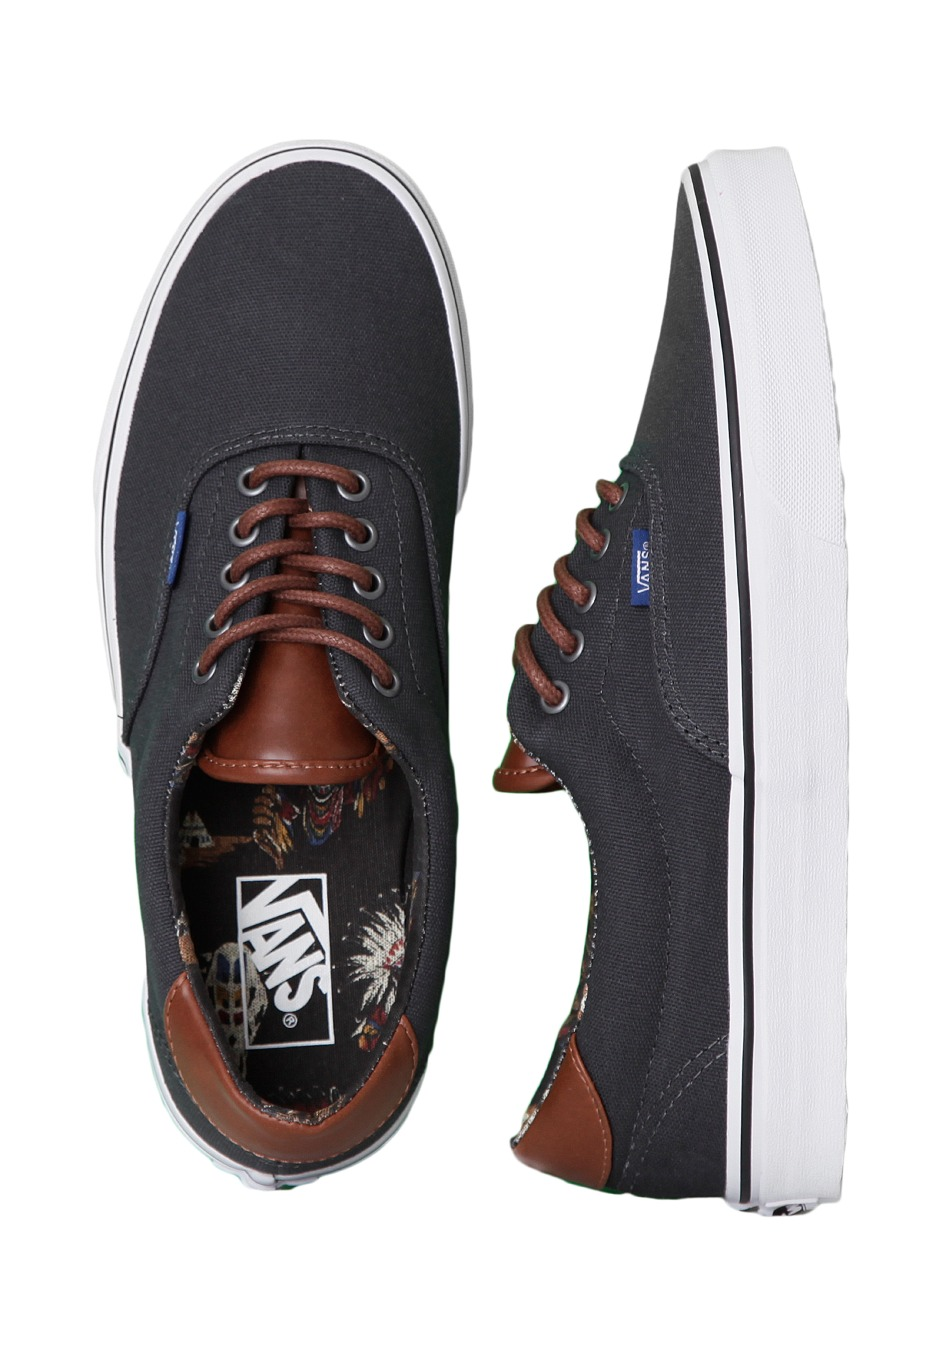 Vans - Era 59 C L Dark Shadow Tribal Leaders - Shoes - Impericon.com UK b4fa9daed8